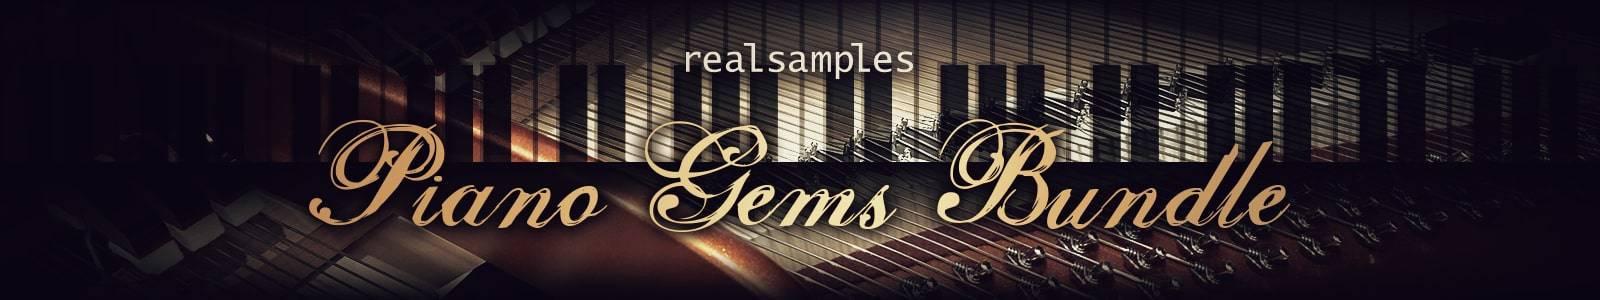 [DTMニュース]precisionsound-piano-gems-bundle-1